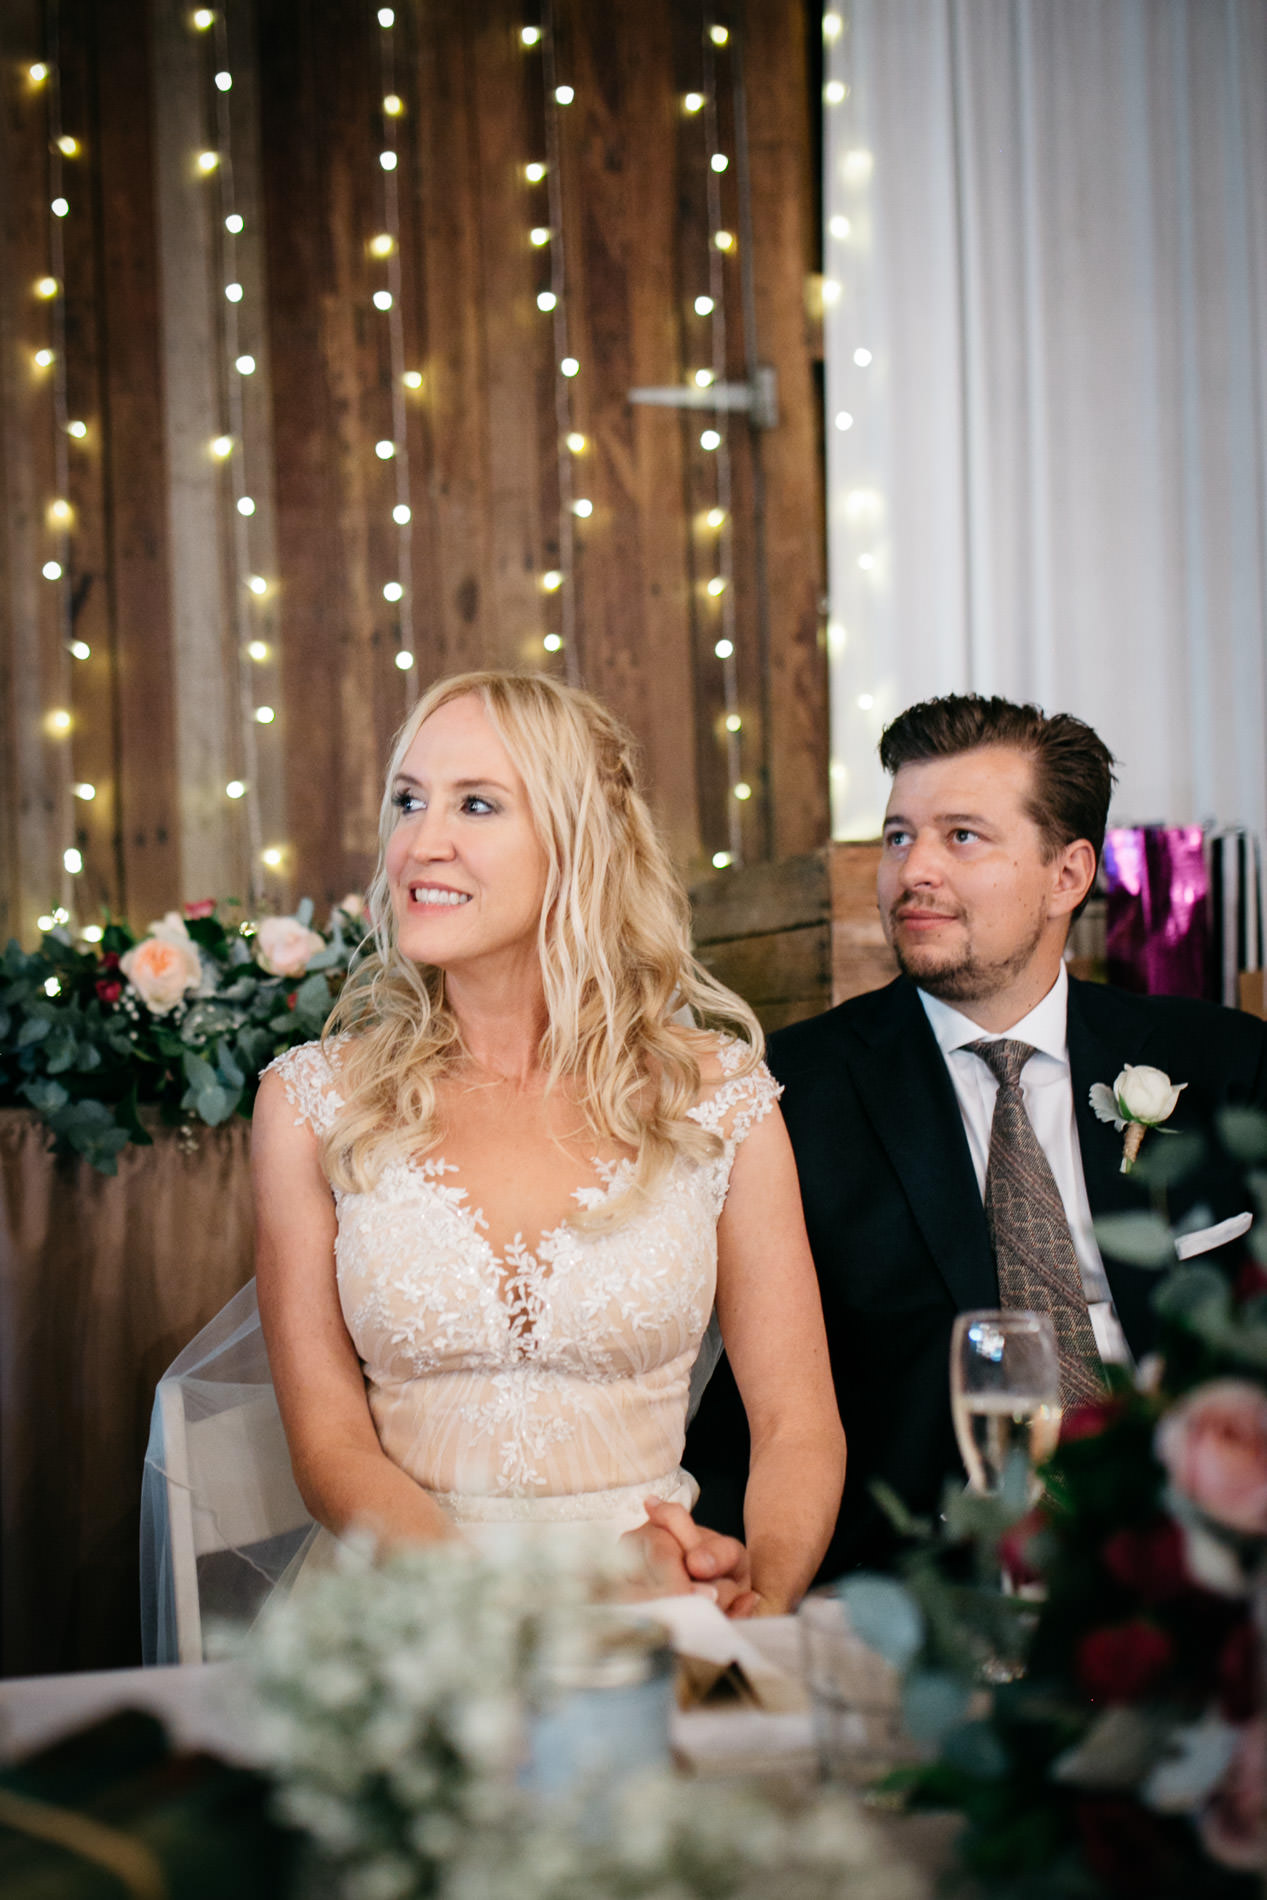 True North Photography_Boomerang Farm_Stacey and Isaac_Gold Coast Wedding_Barm Wedding_Hinterland Wedding-185.jpg